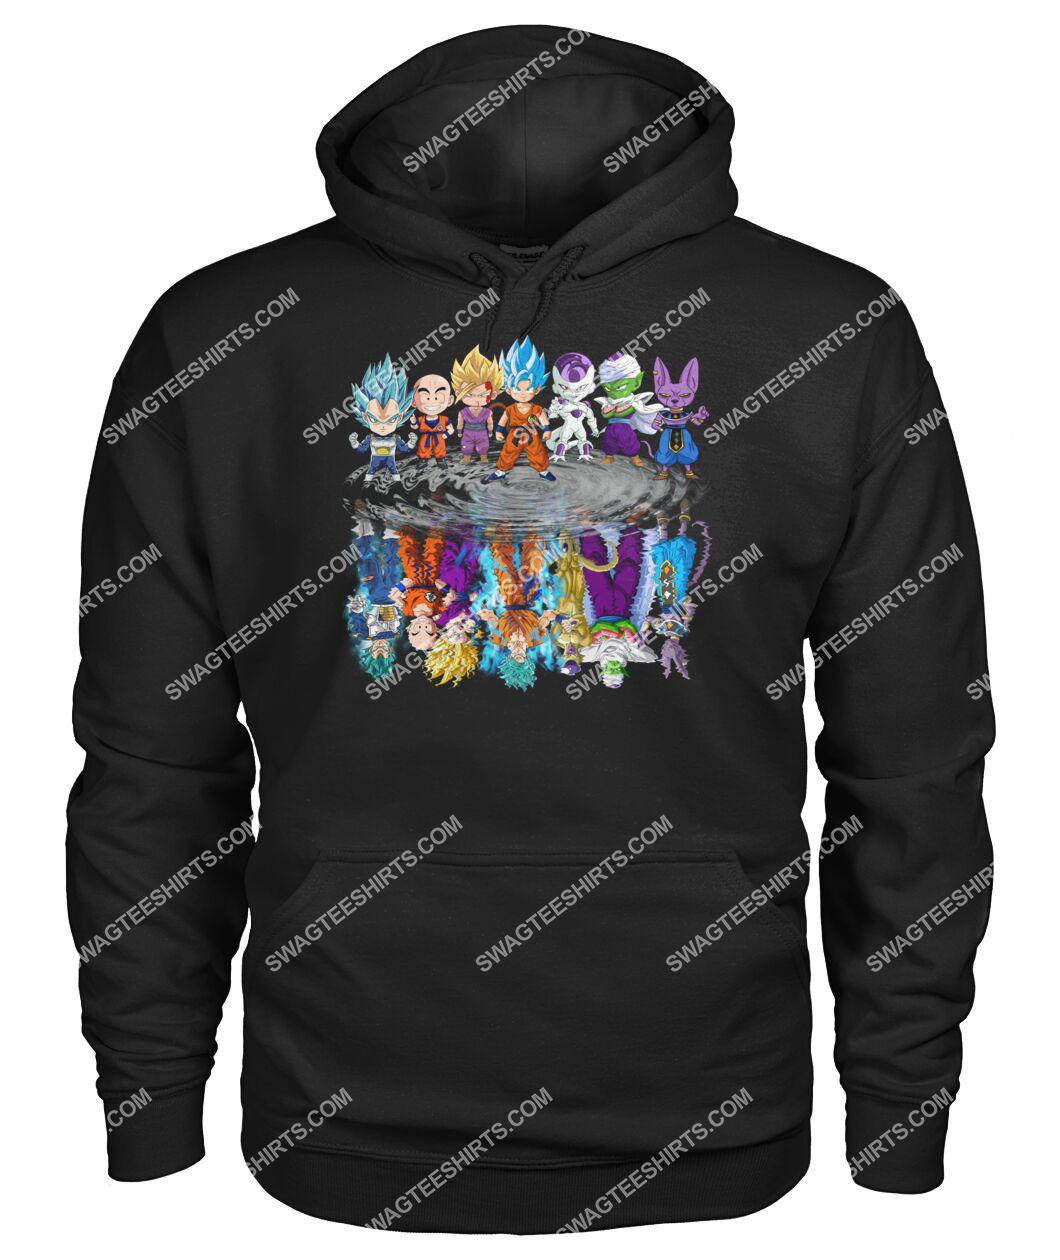 dragon ball z characters chibi water reflection hoodie 1